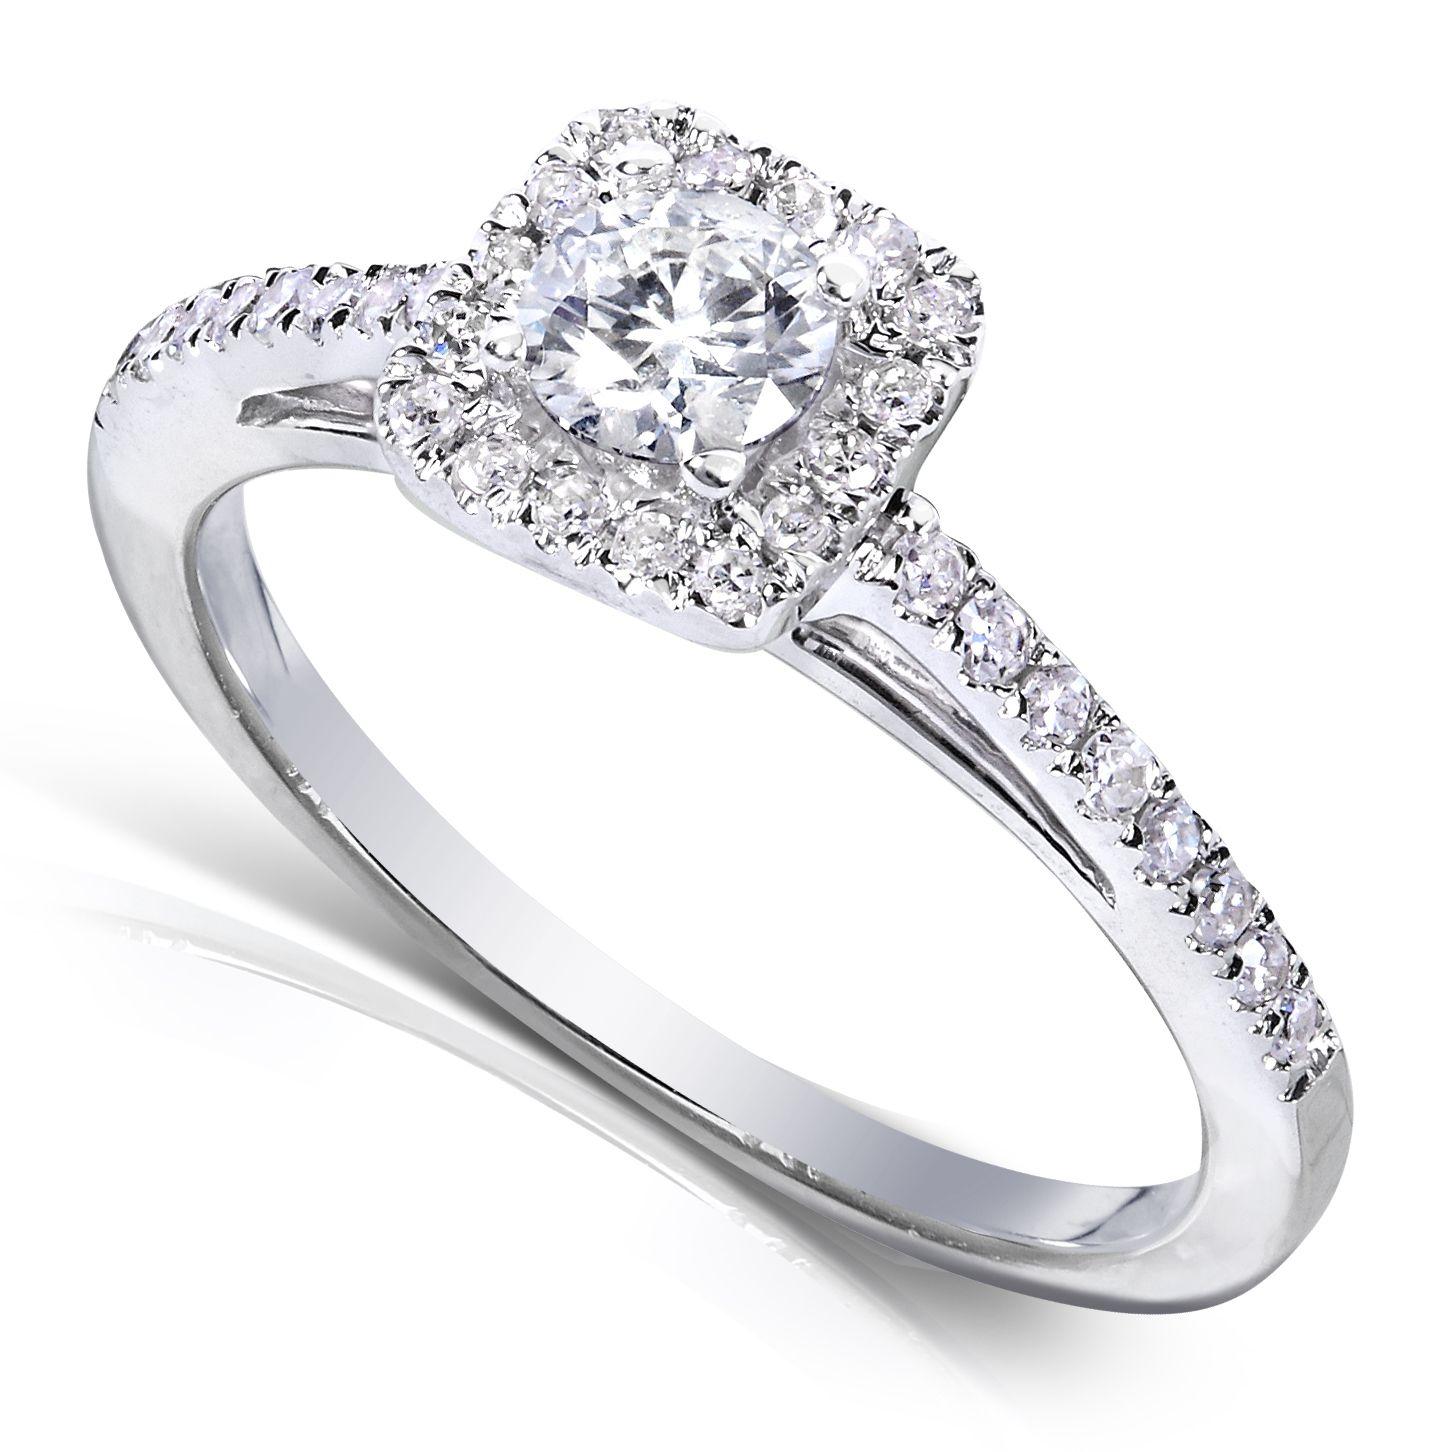 Kobelli 1 3 Carat Ct Tw Diamond Halo Engagement Ring In 14k White Gold Size 10 5 Round Diamond Engagement Rings Halo Diamond Engagement Ring Halo Diamond